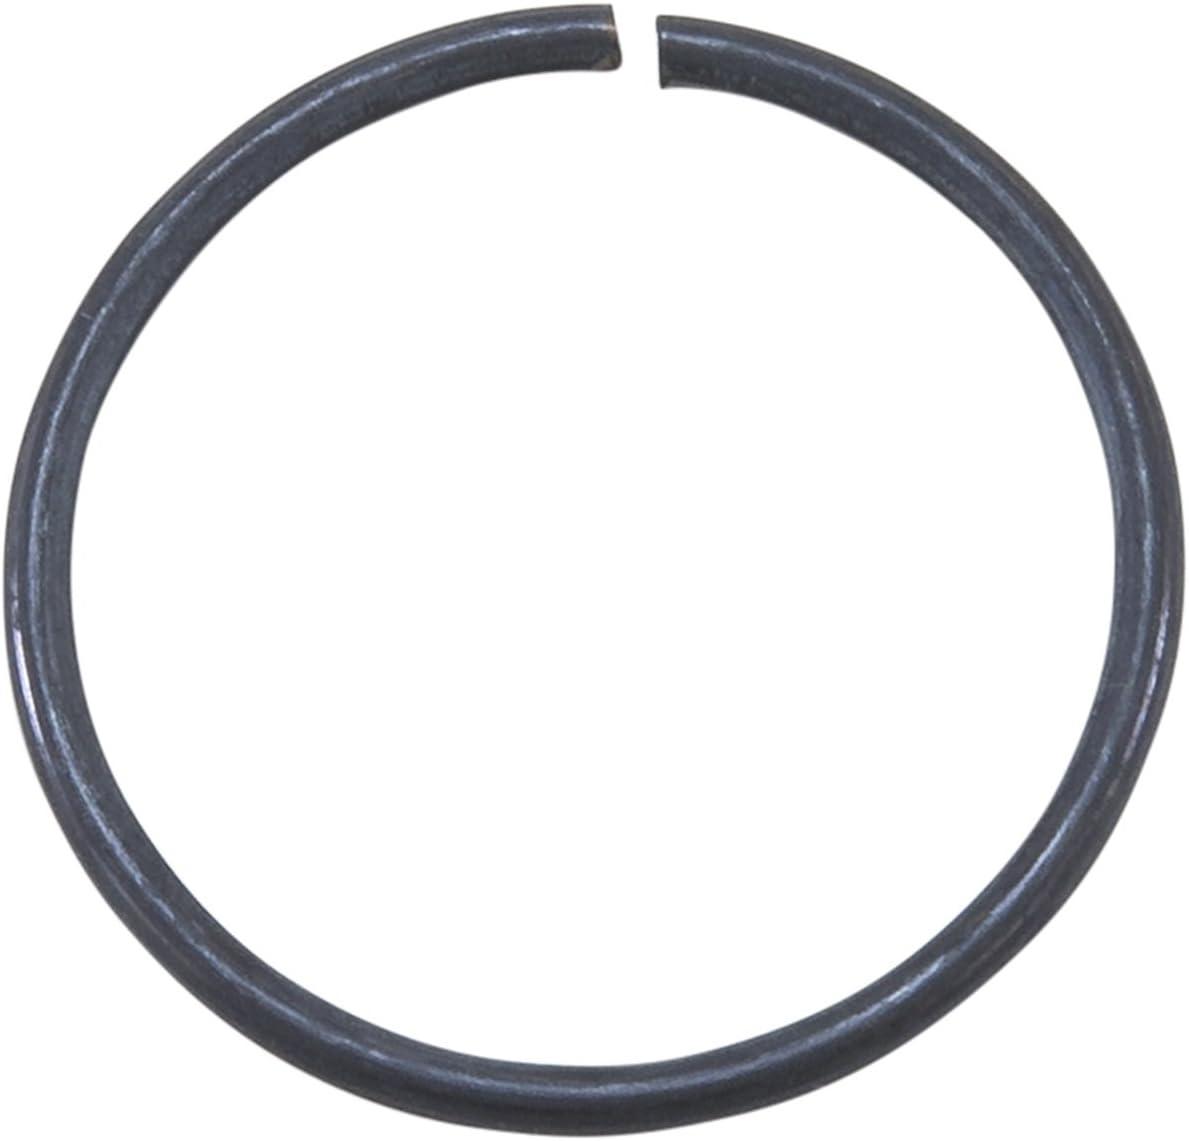 Bombing free shipping Yukon Gear High material Axle YSPSR-017 Rear Bearing Ring Snap Retain